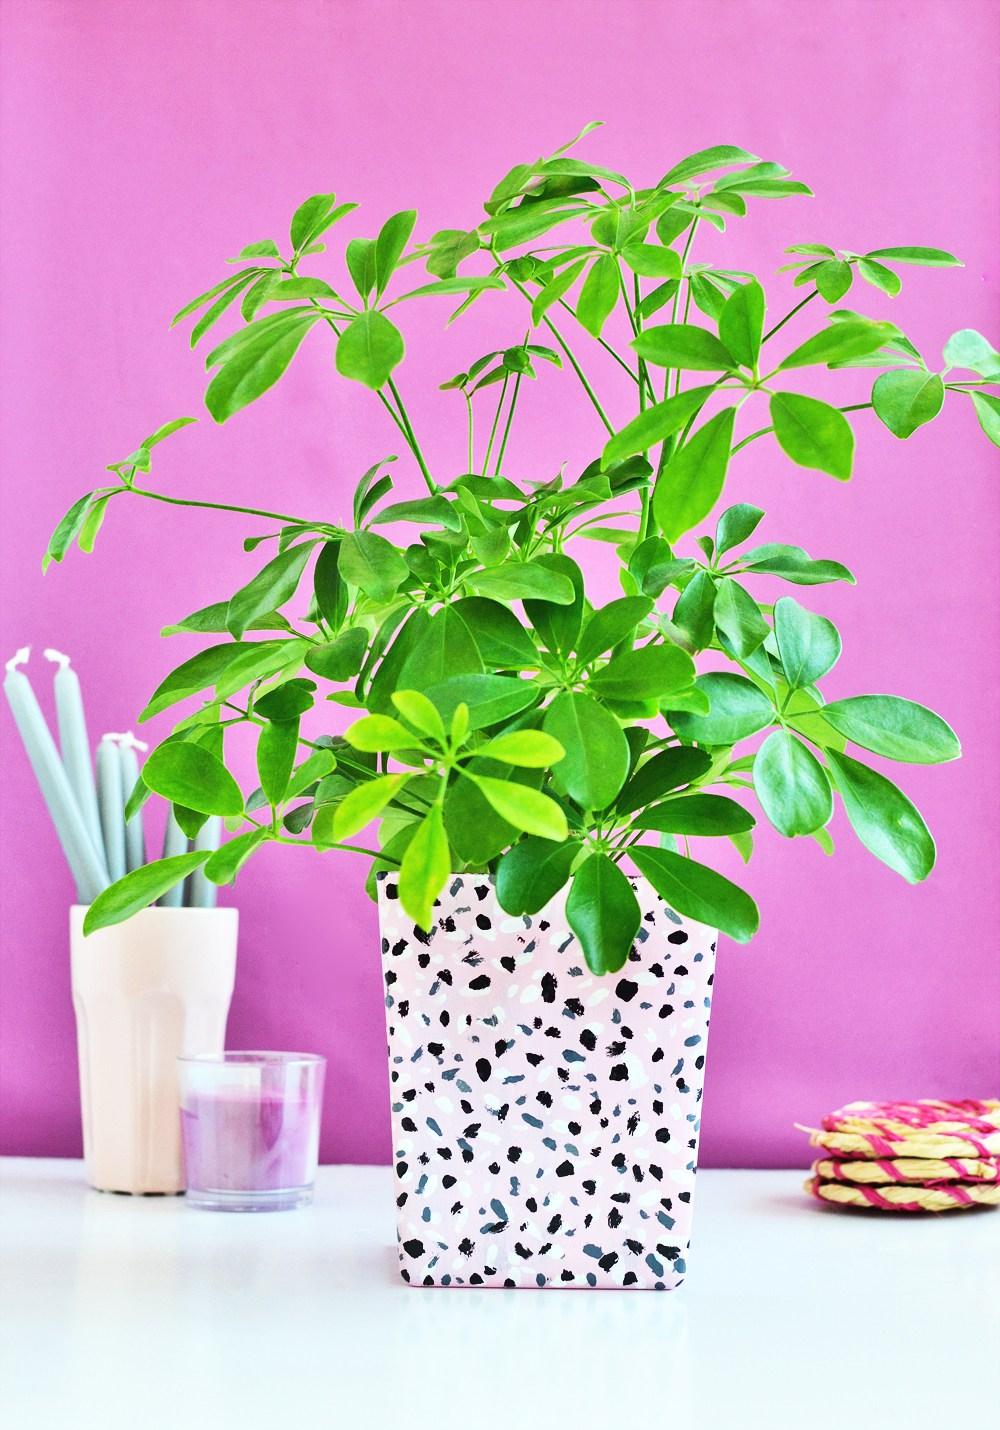 DIY terrazzo tile inspired planter